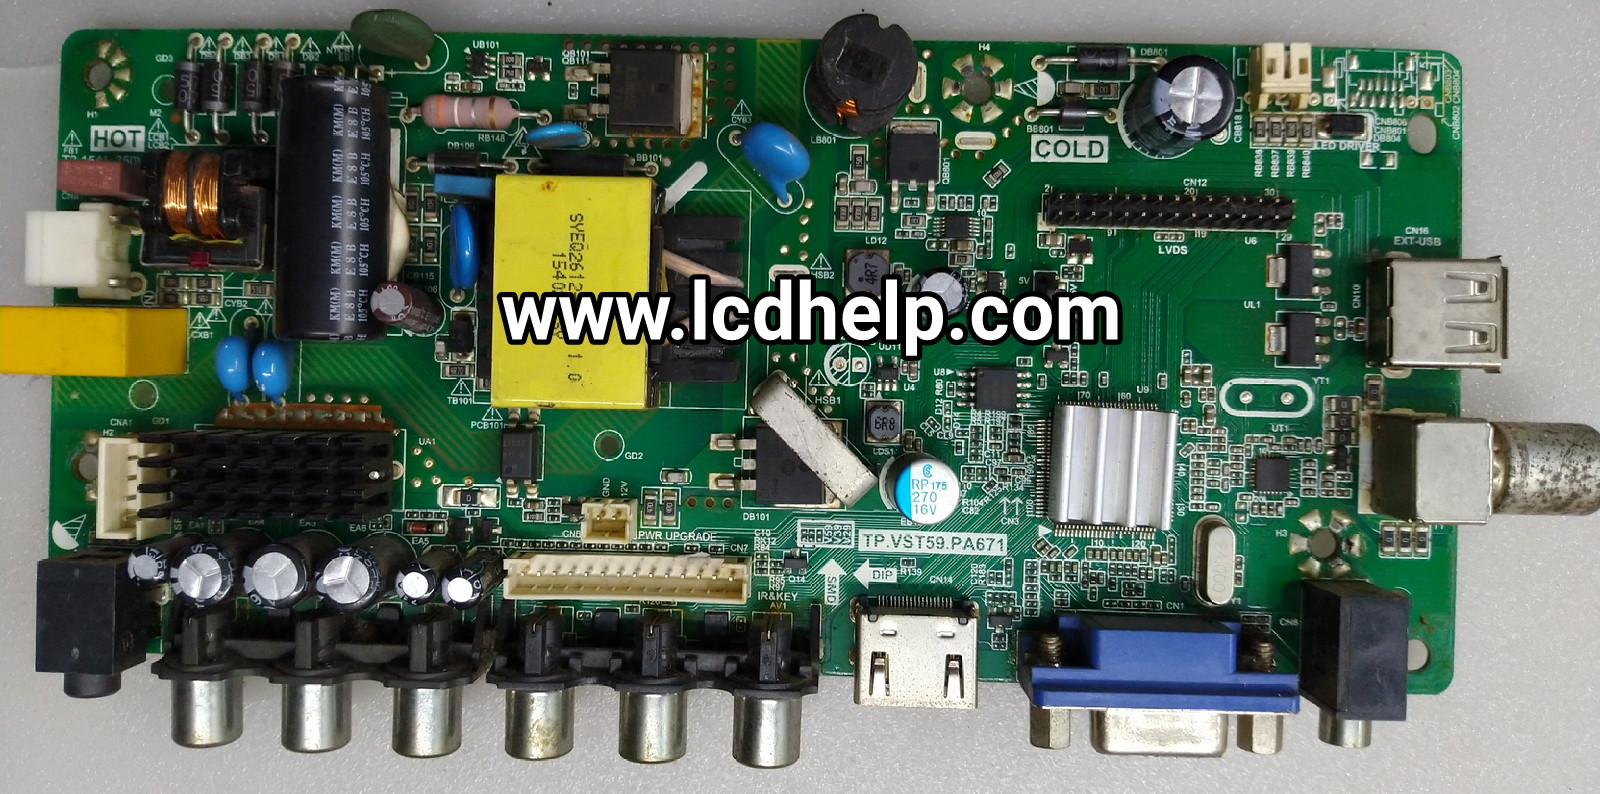 LED TV Board TP VST59 PA671 Voltage Data - LCD HELP